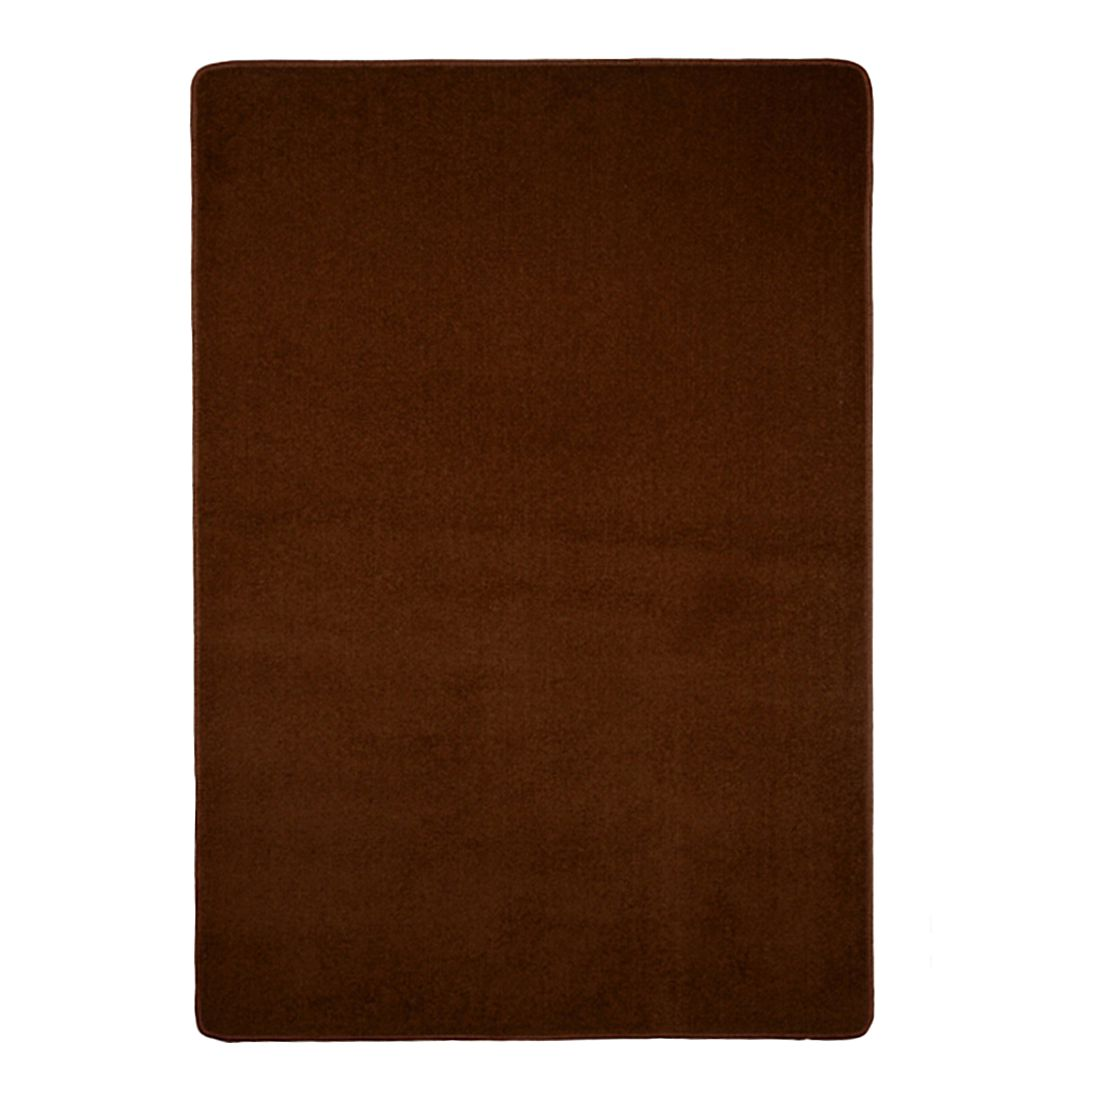 Teppich Dynasty – Braun – 190 x 133 cm, KC-Handel kaufen